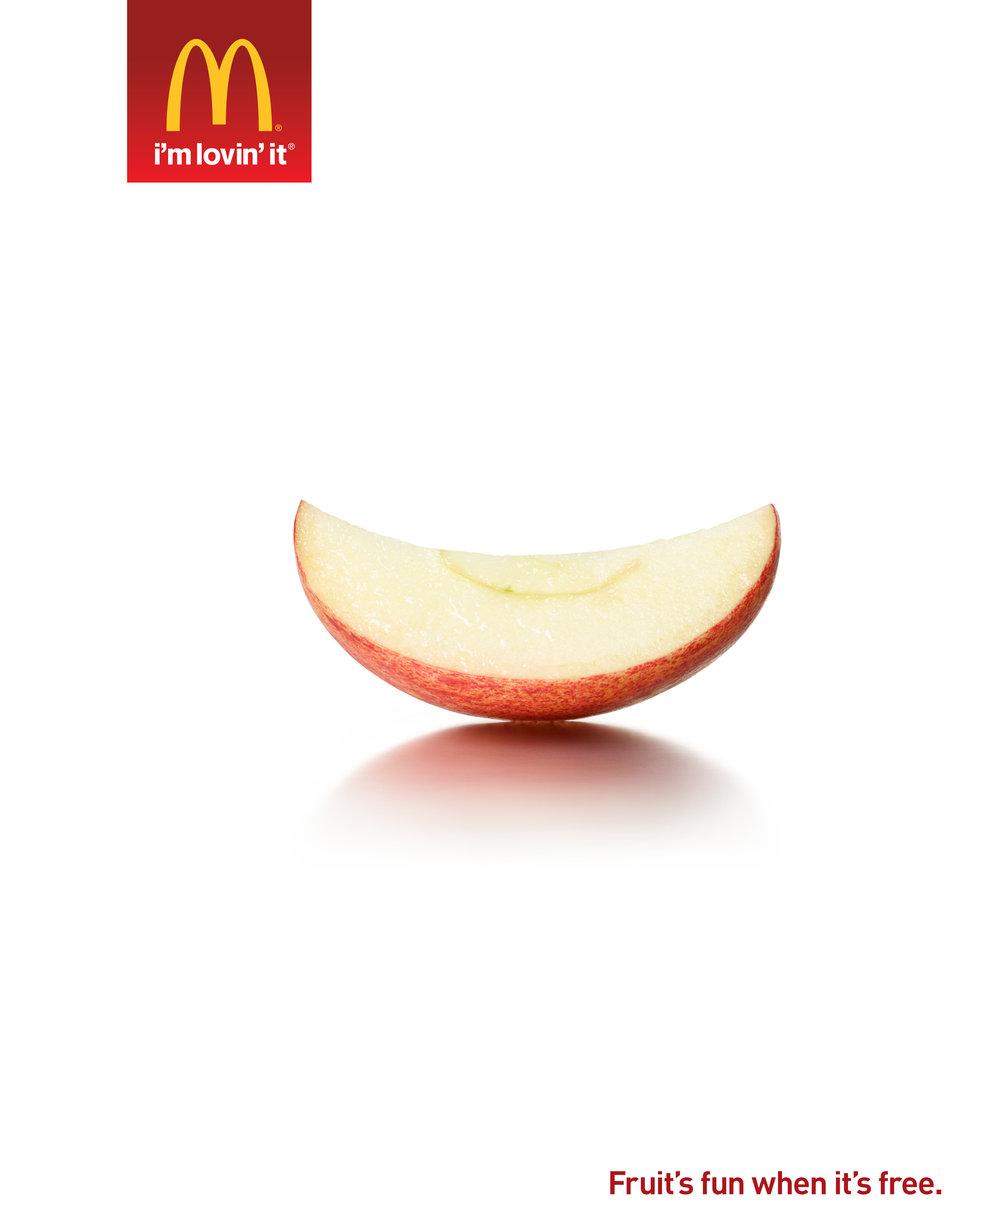 McDonalds Free Fruit Press copy.jpg